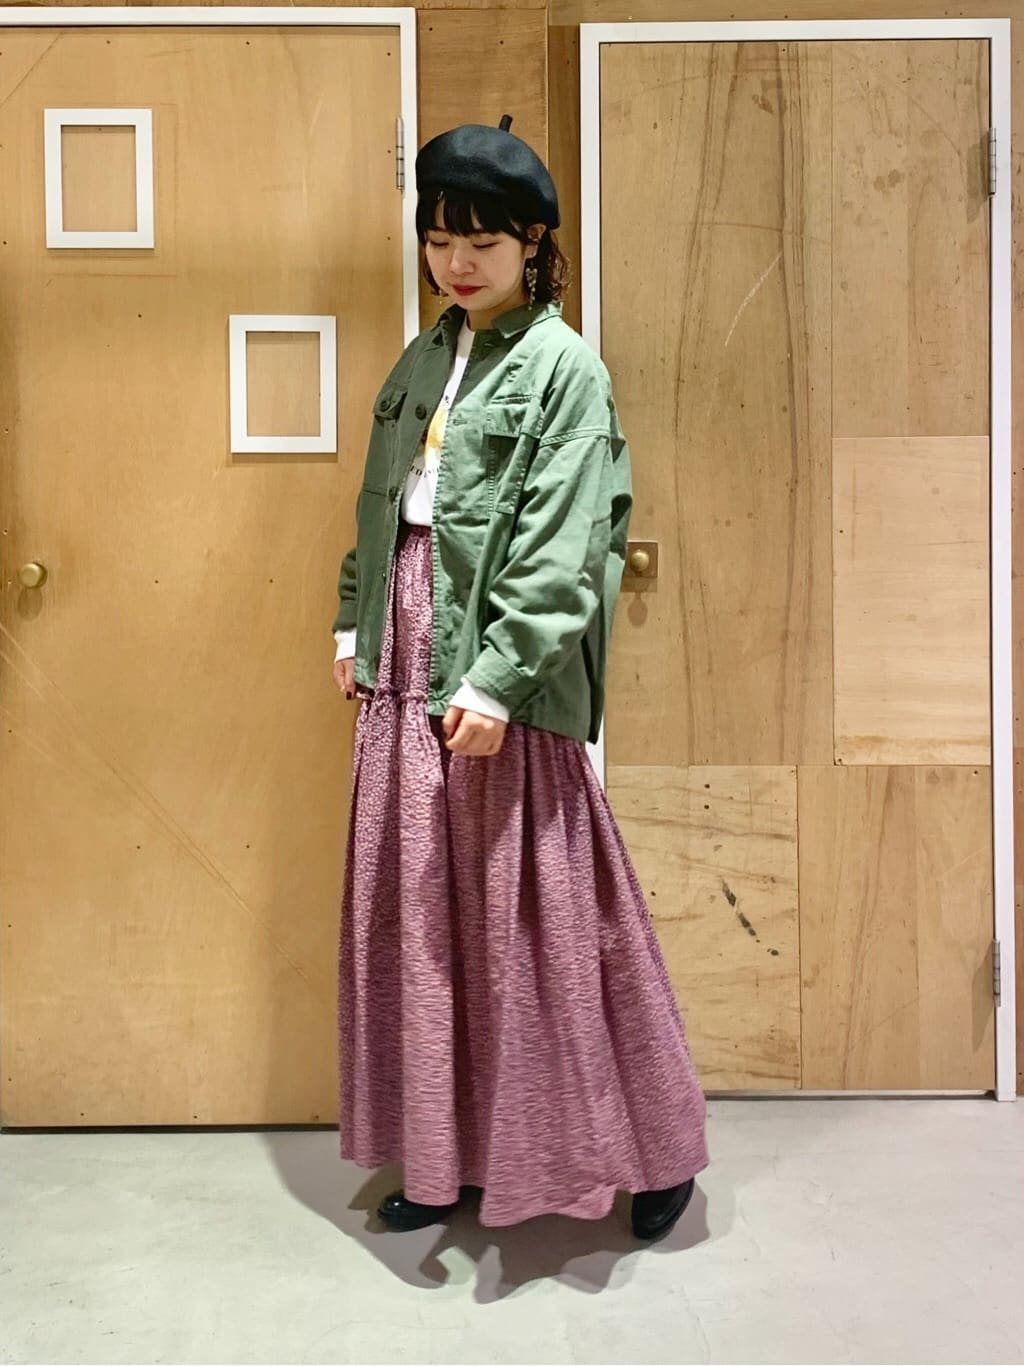 l'atelier du savon 新宿ミロード 身長:153cm 2021.09.14